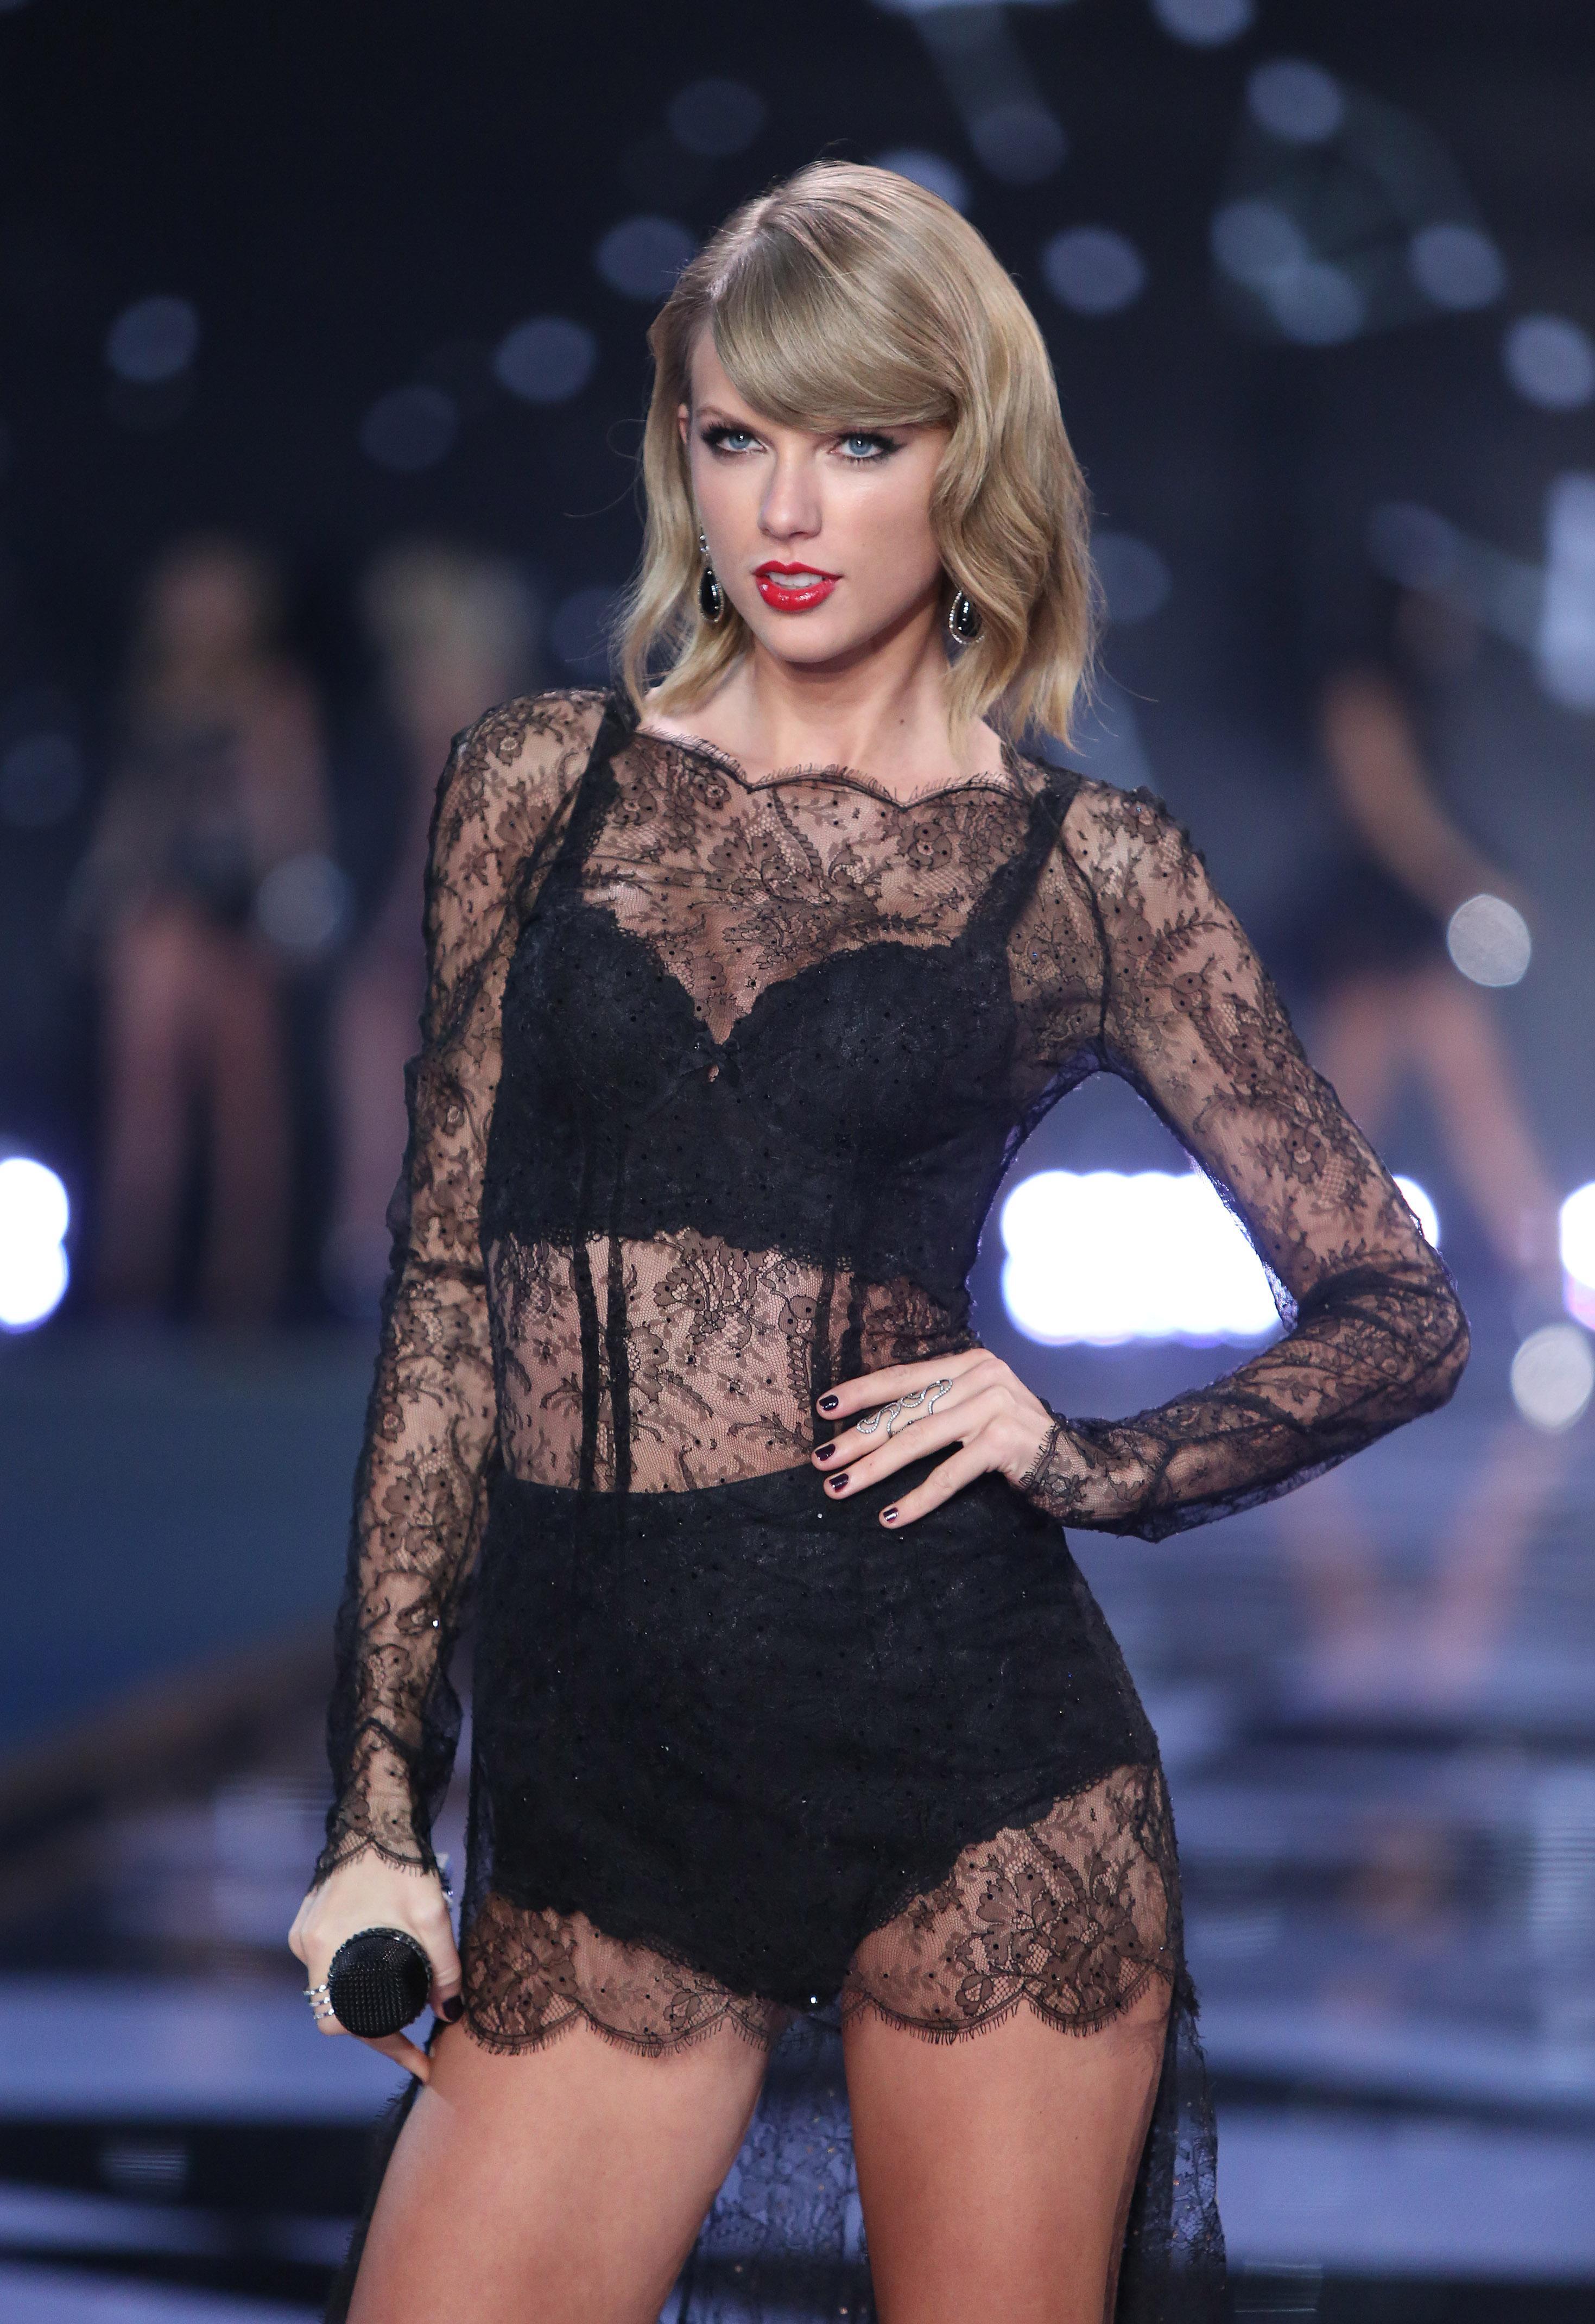 6de7e88c1bd Taylor Swift stars at Victoria's Secret show - Washington Times